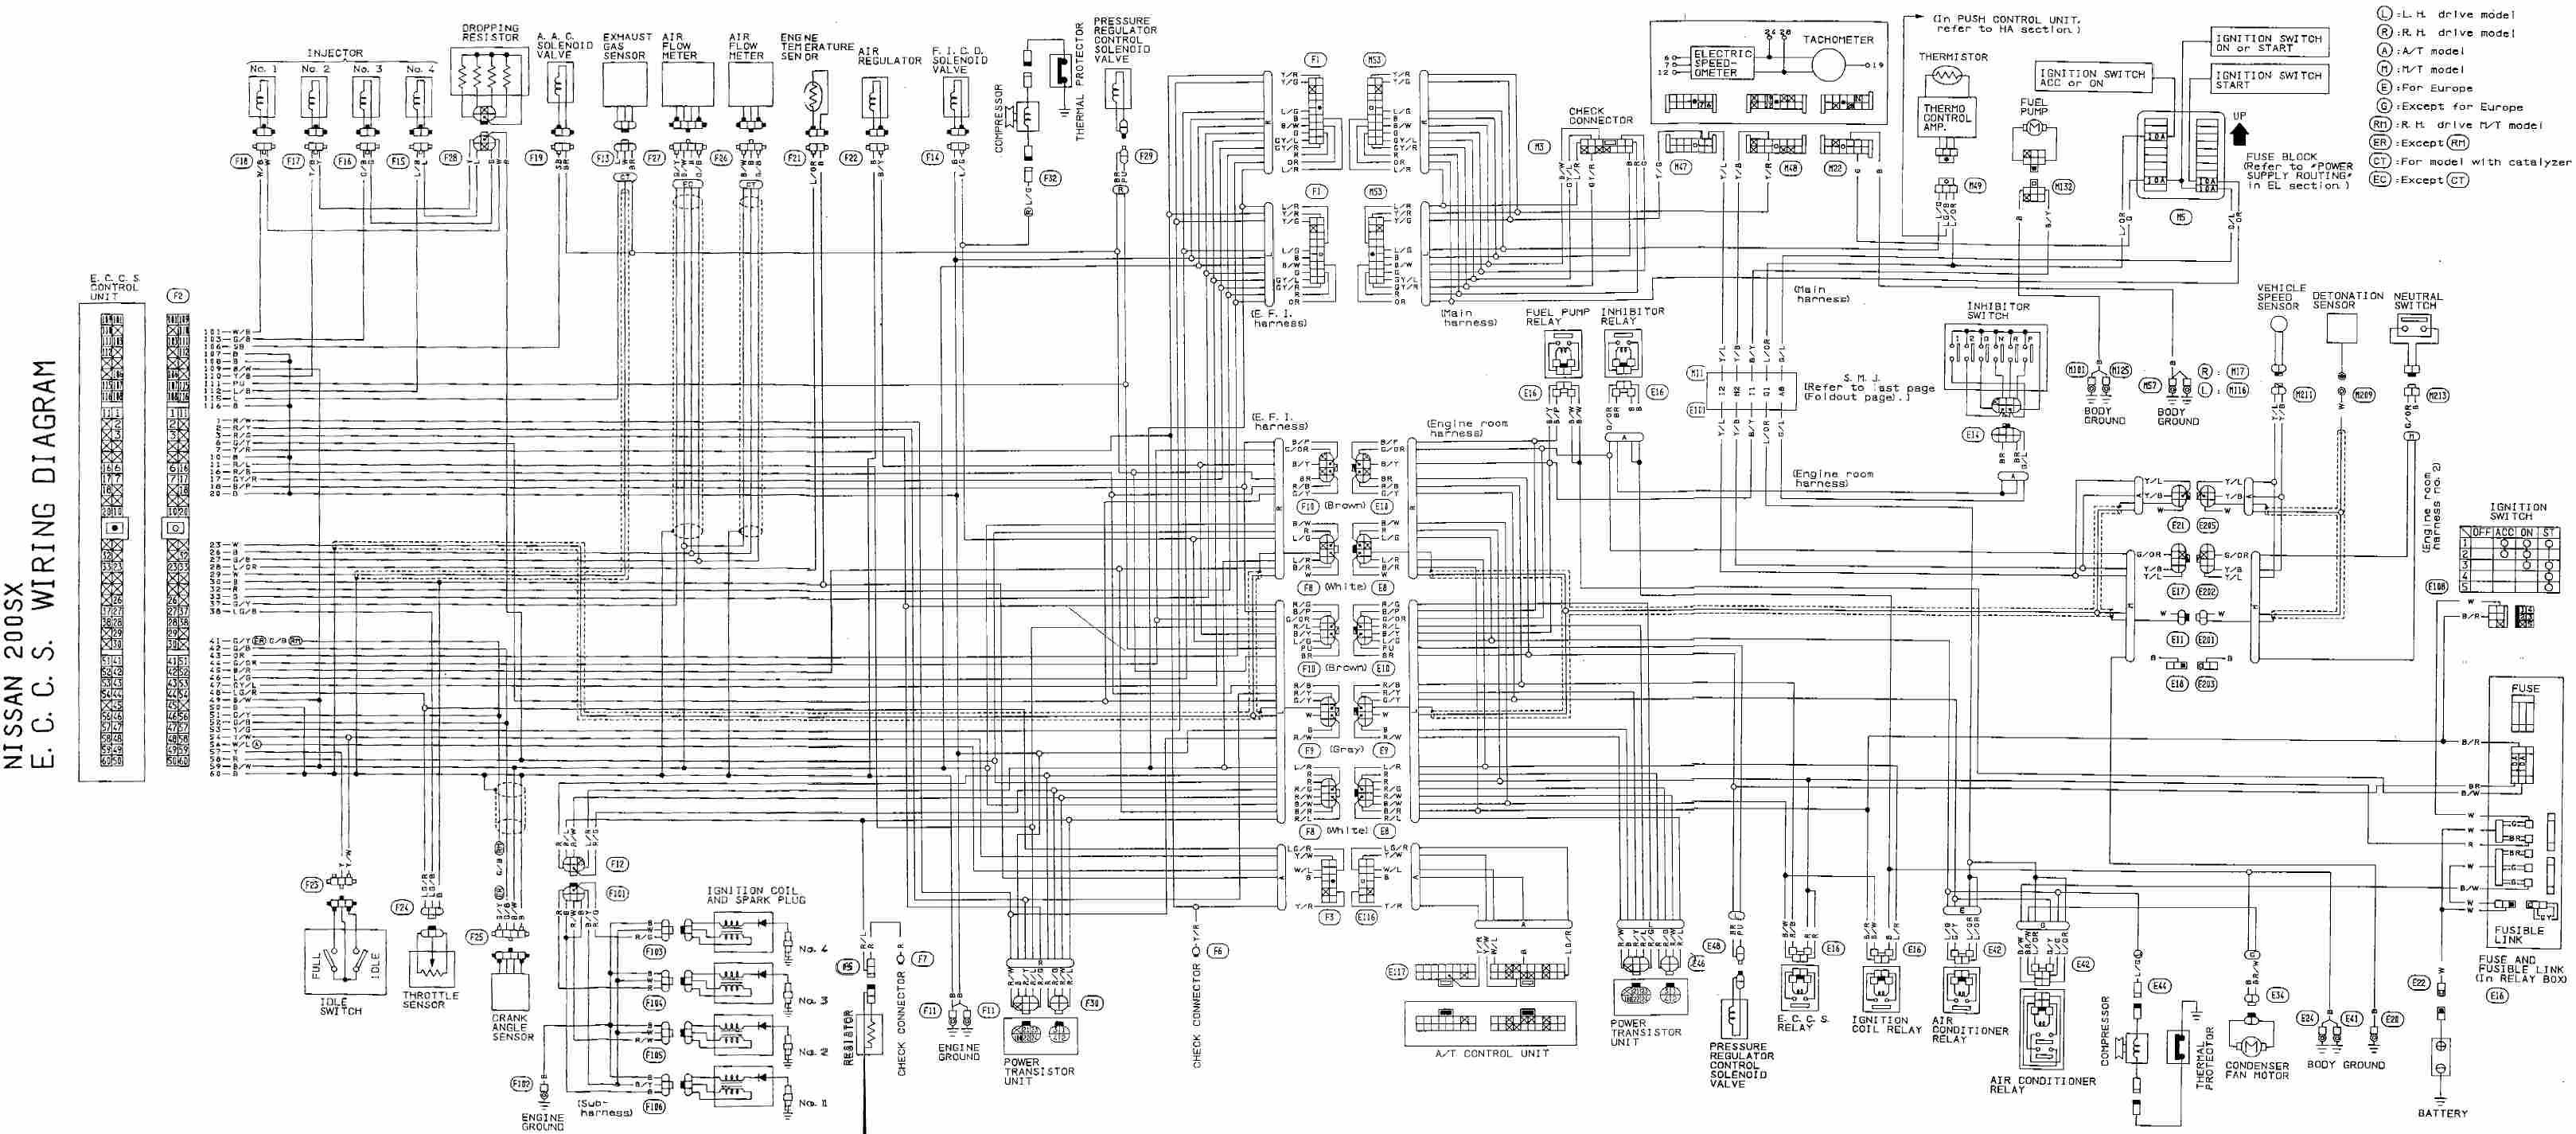 hight resolution of 350z engine wiring diagram wiring diagrams2003 nissan 350z wiring diagram wiring diagram box 350z engine wiring